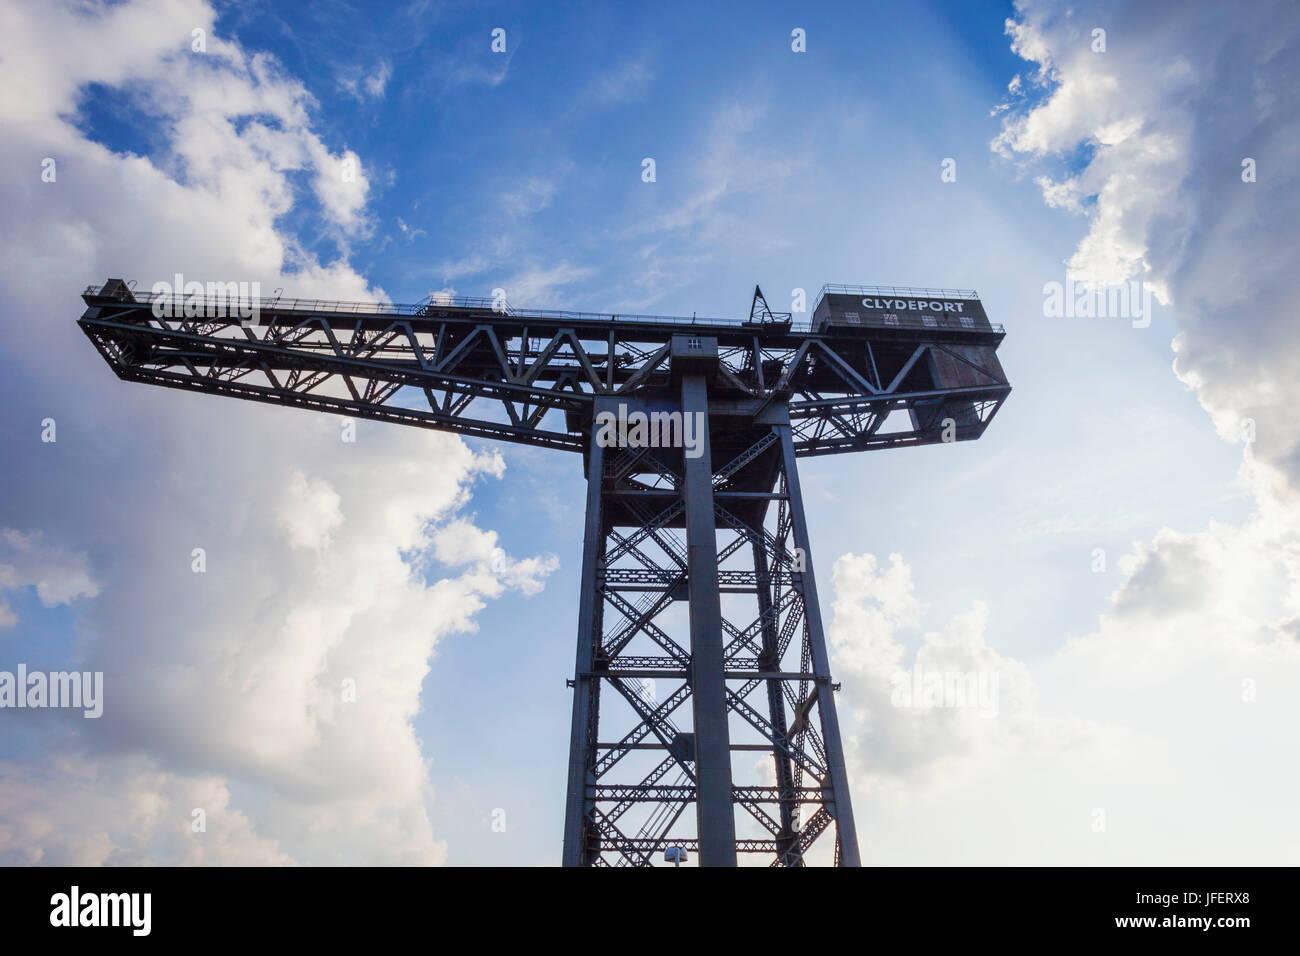 Scotland, Glasgow, Clydebank, Finnieston Crane - Stock Image